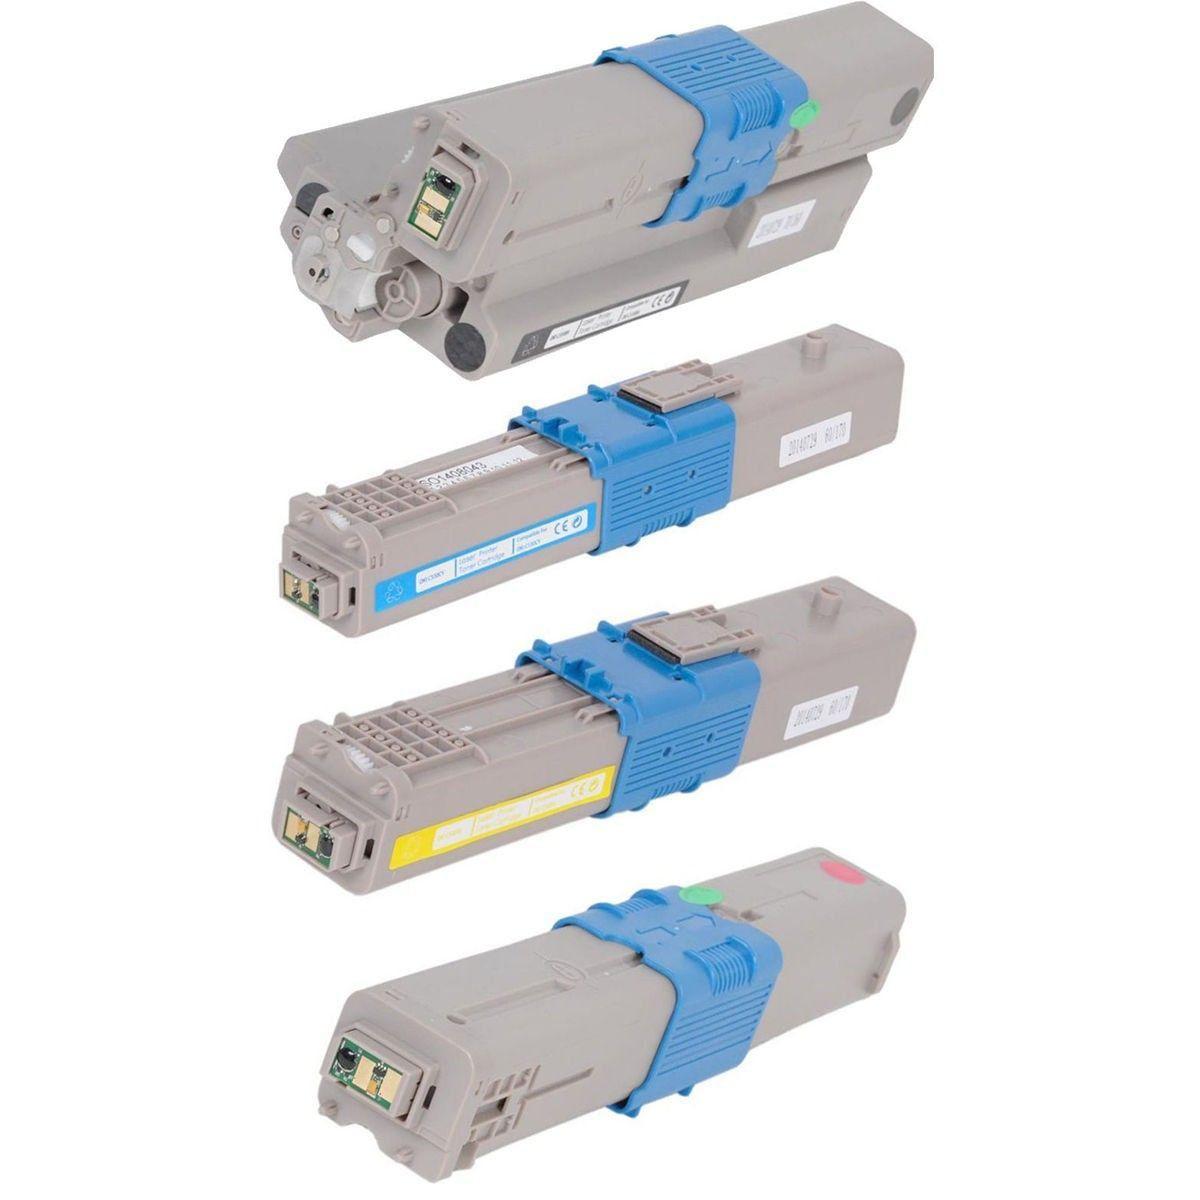 Compatível: Kit Colorido de Toner C330 C530 para Okidata MC561 MC361 C530dn C330dn MC351 C310n MC361dn C331 MC362w